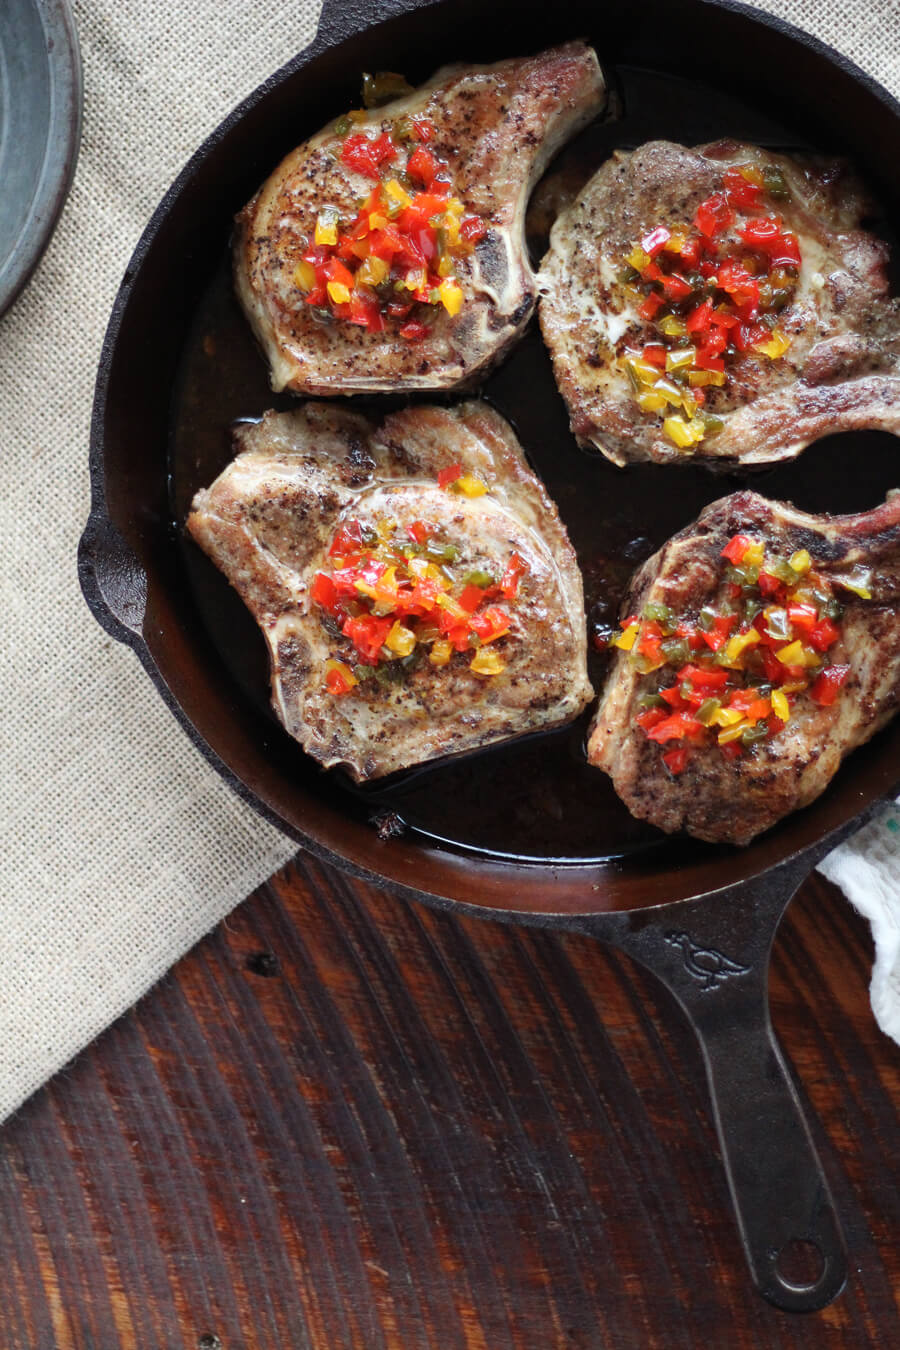 Pepper Jelly Skillet Pork Chops